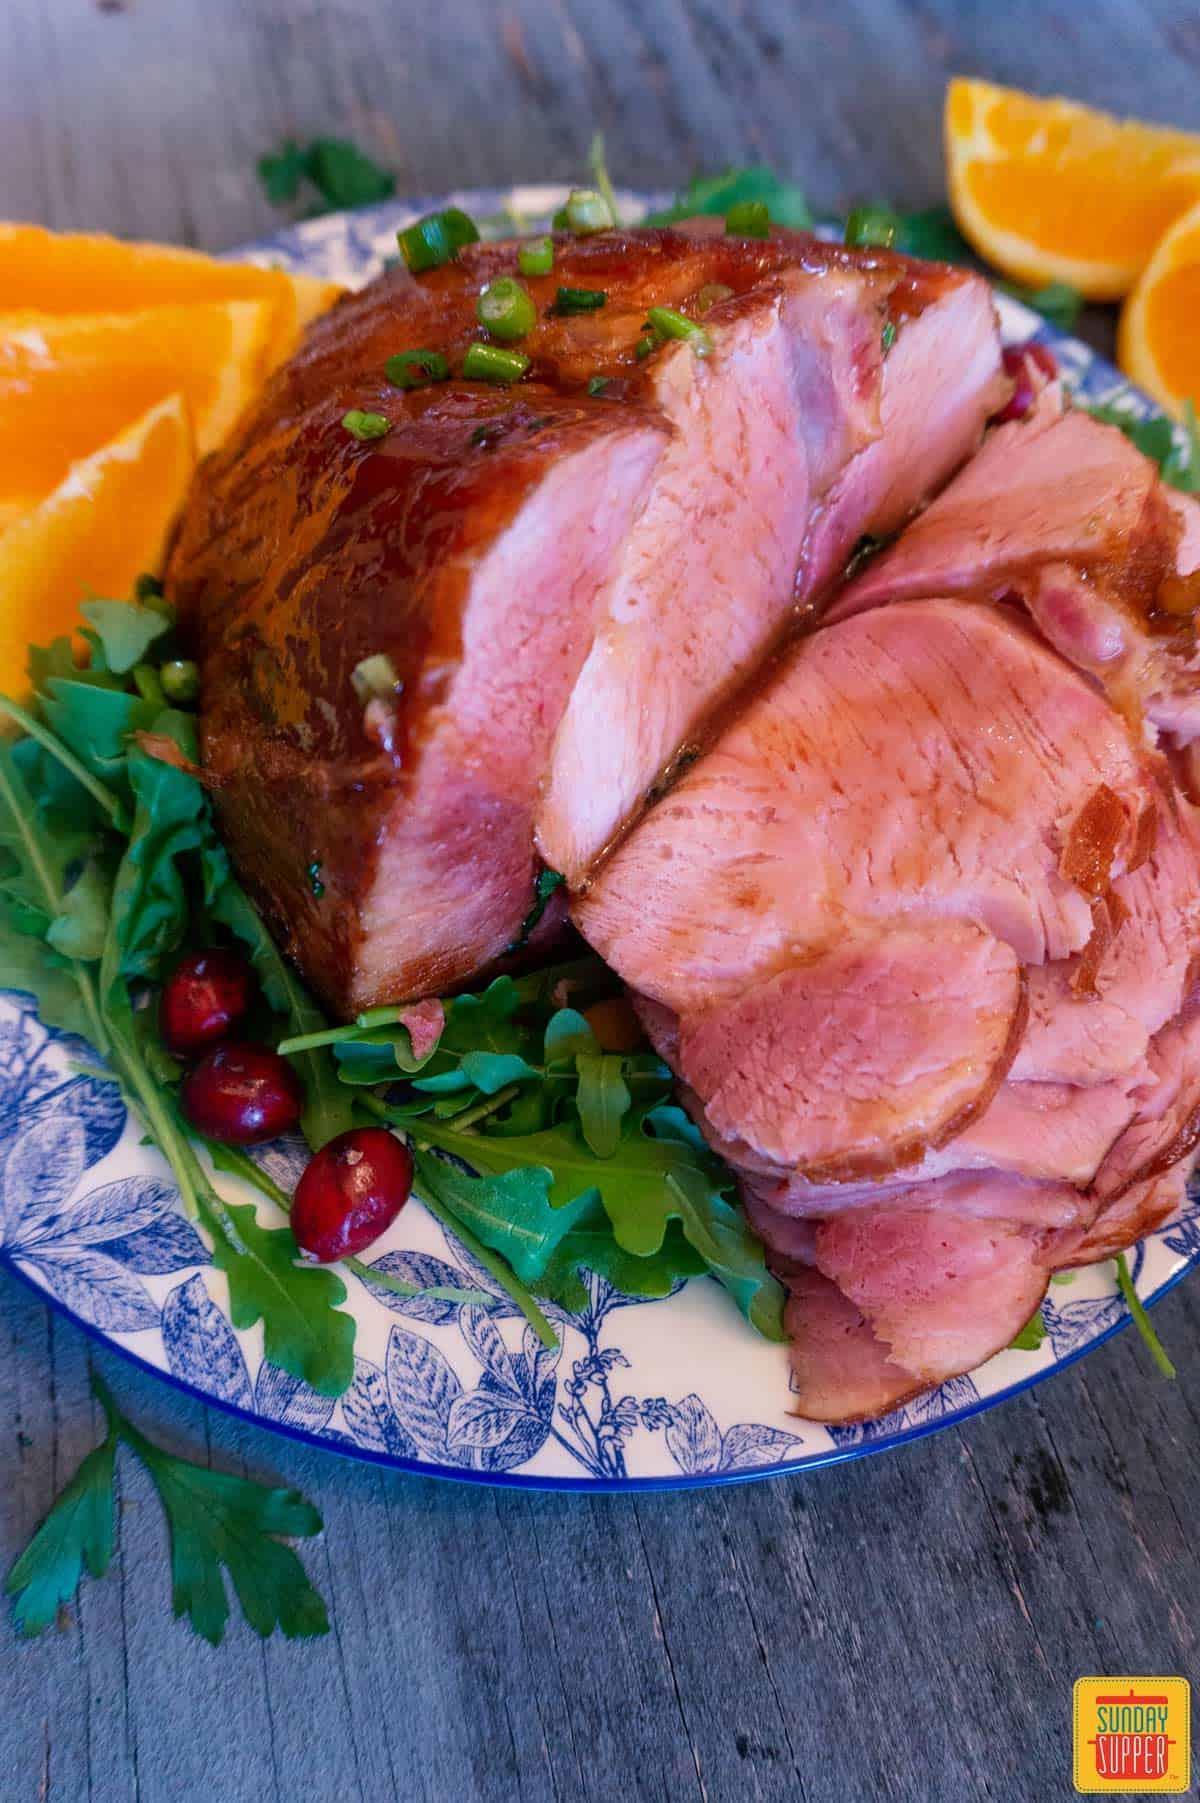 Sliced honey glazed ham with extra glaze on a platter